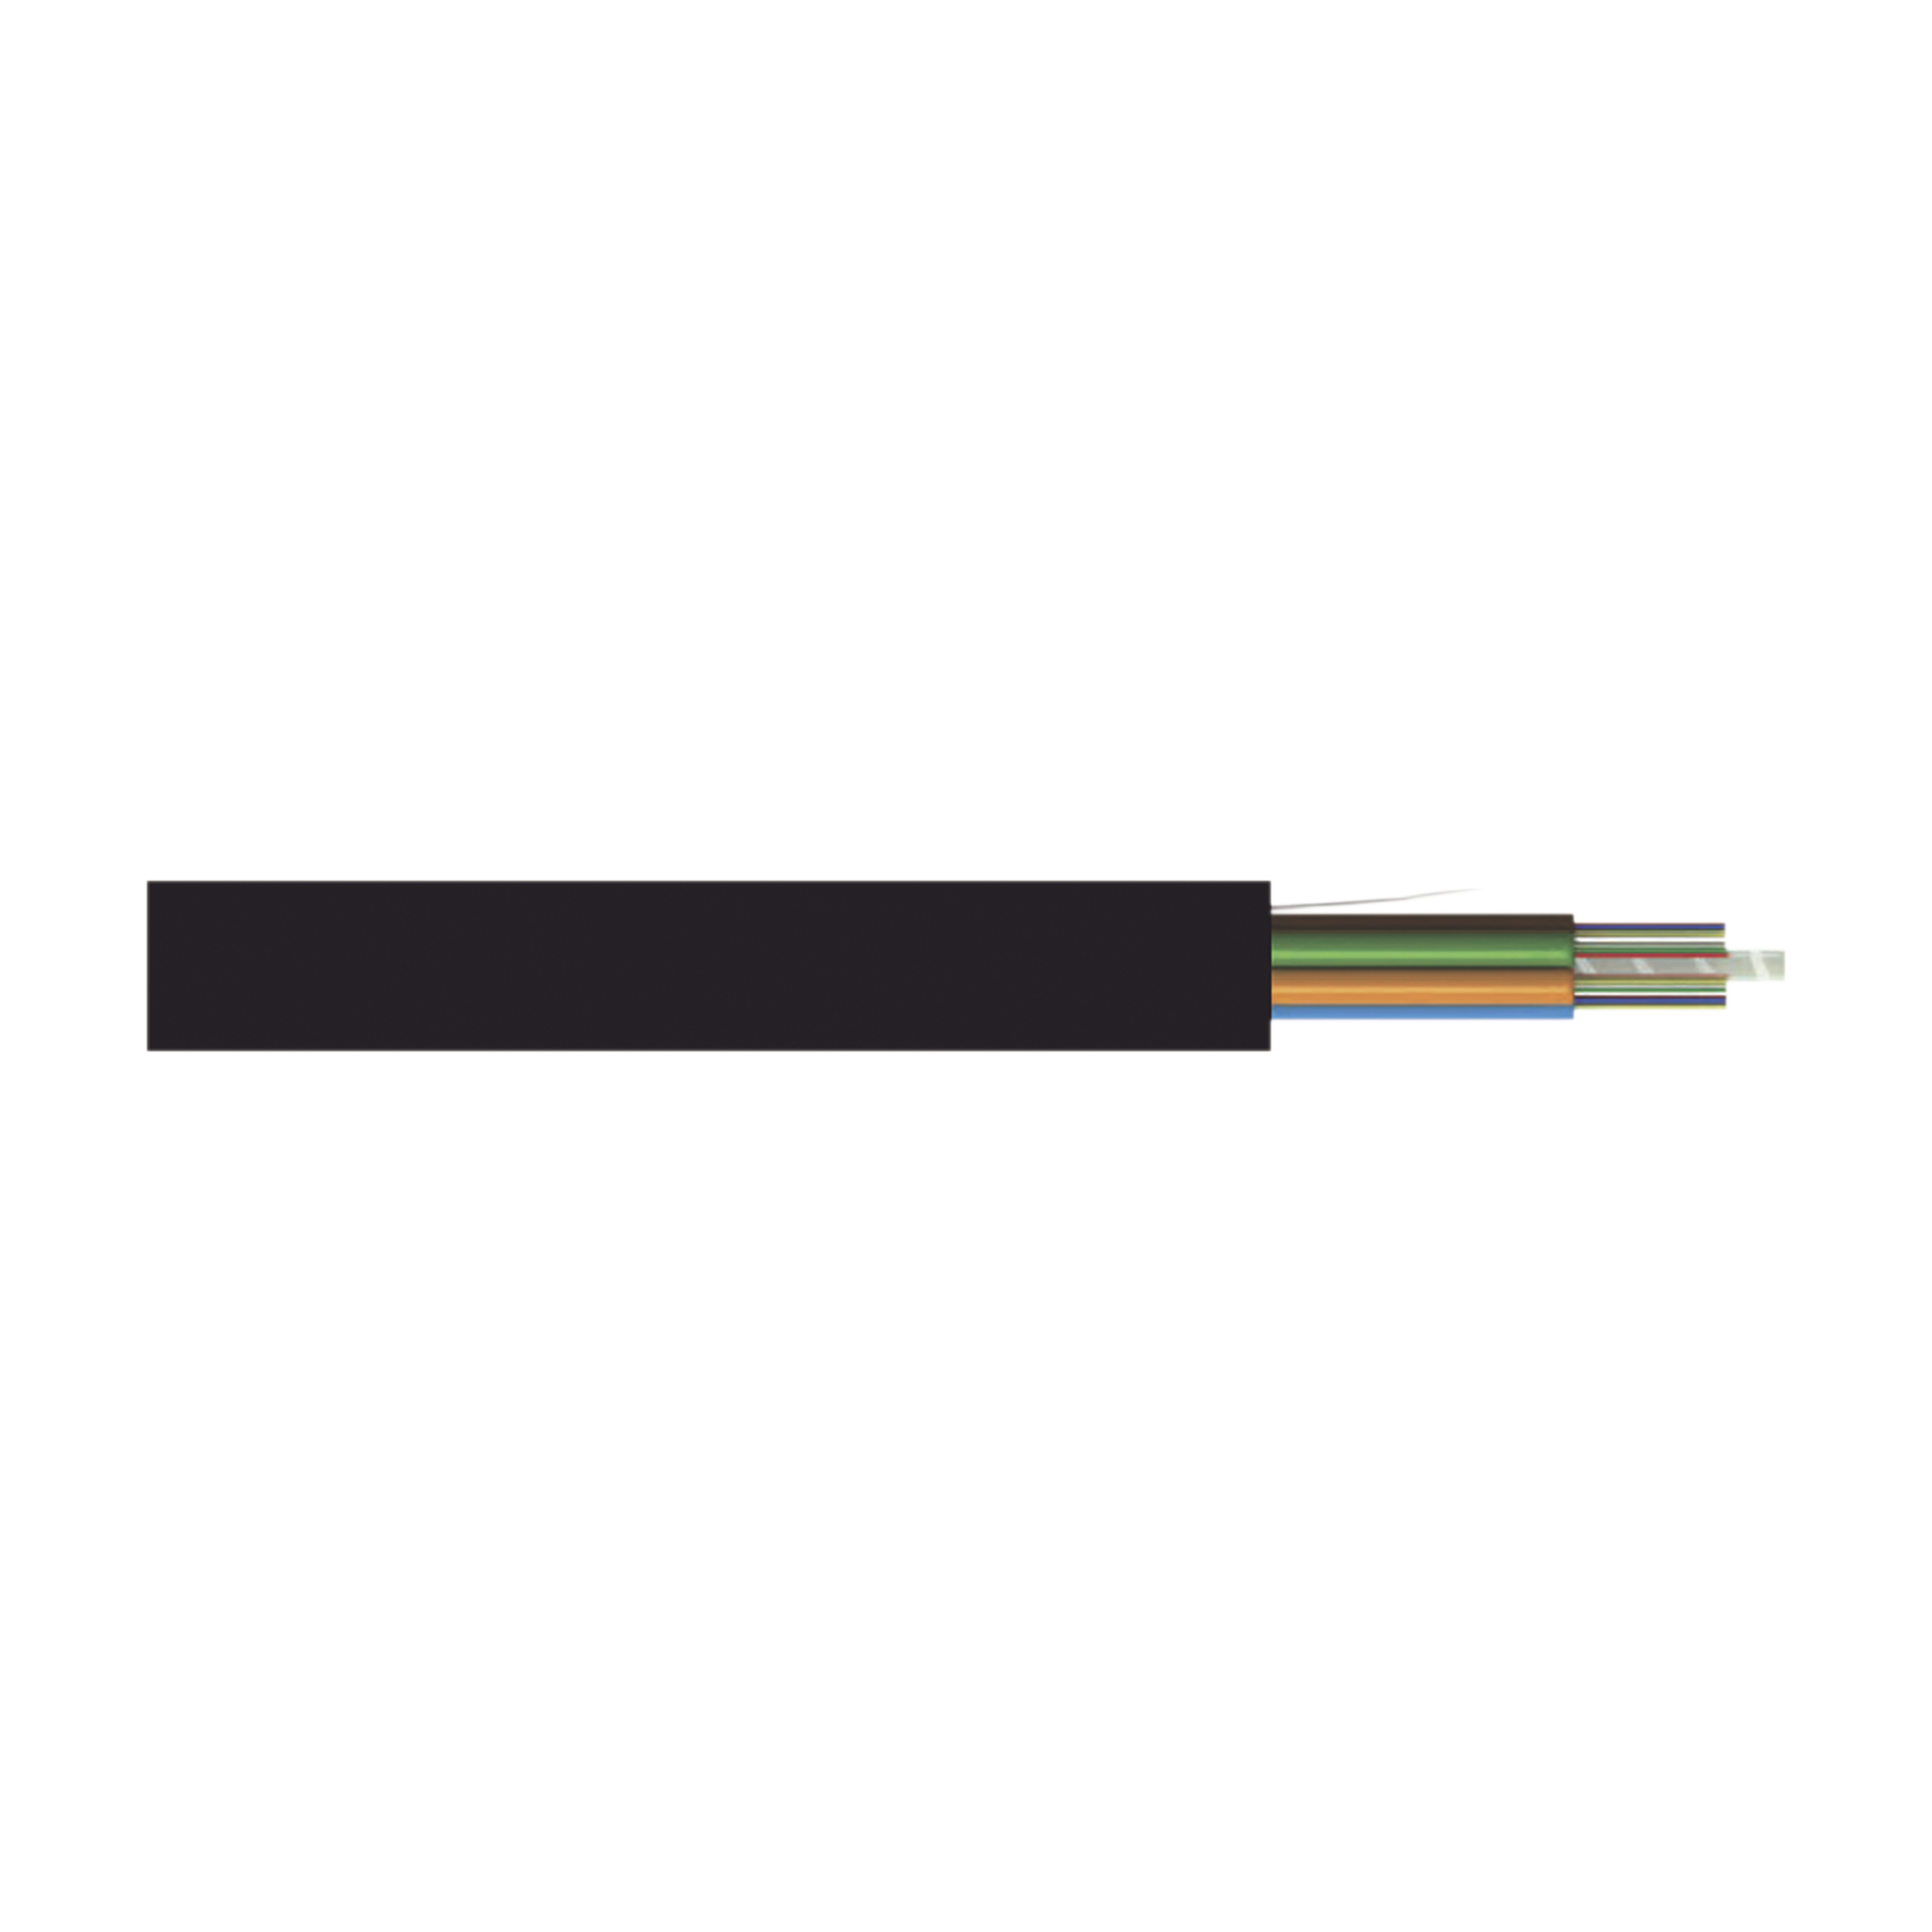 Bala IP 4 Megapixel / ULTRA BAJA ILUMINACIóN / 50 mts IR EXIR / Lente Mot. 2.8 a 12 mm / WDR / IP67/ IK10 / Vídeo Análisis / Entrada-Salida audio y alarma / PoE+ / MicroSD